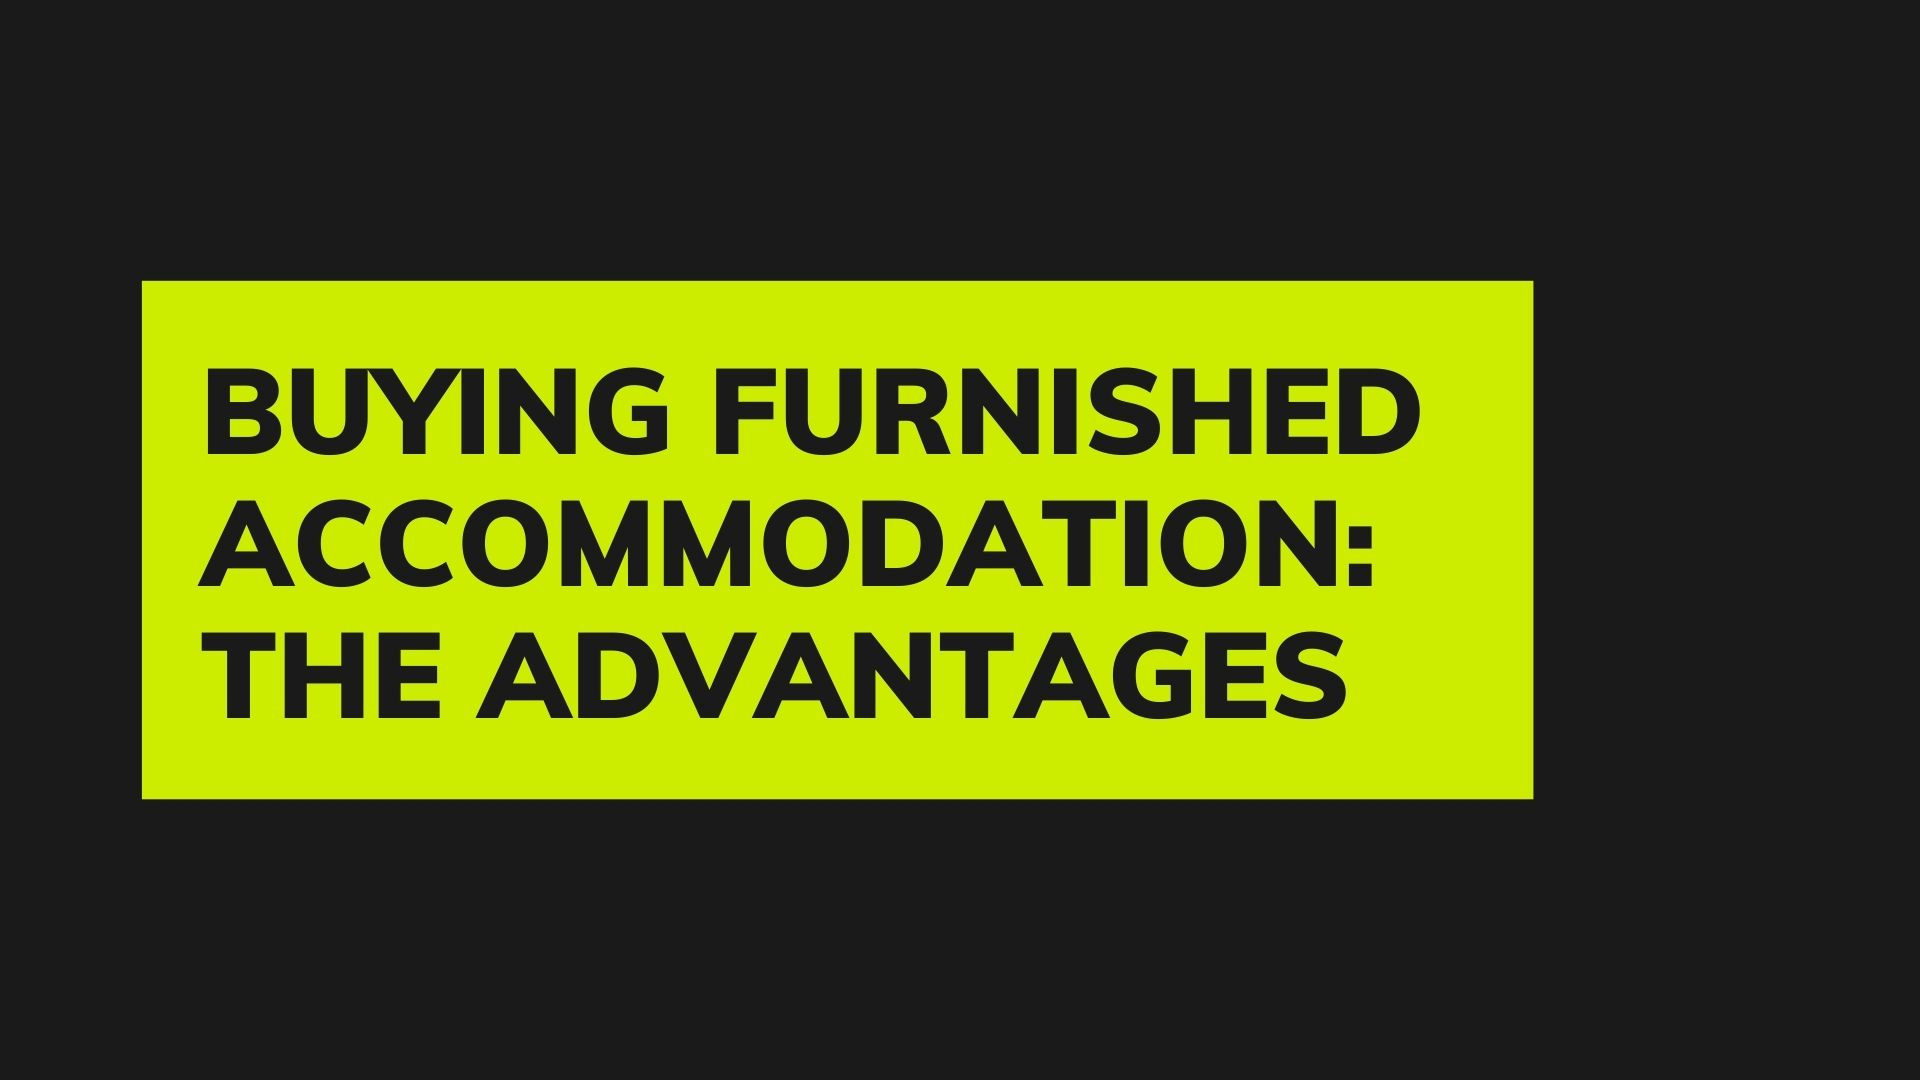 Buying furnished accommodation: the advantages